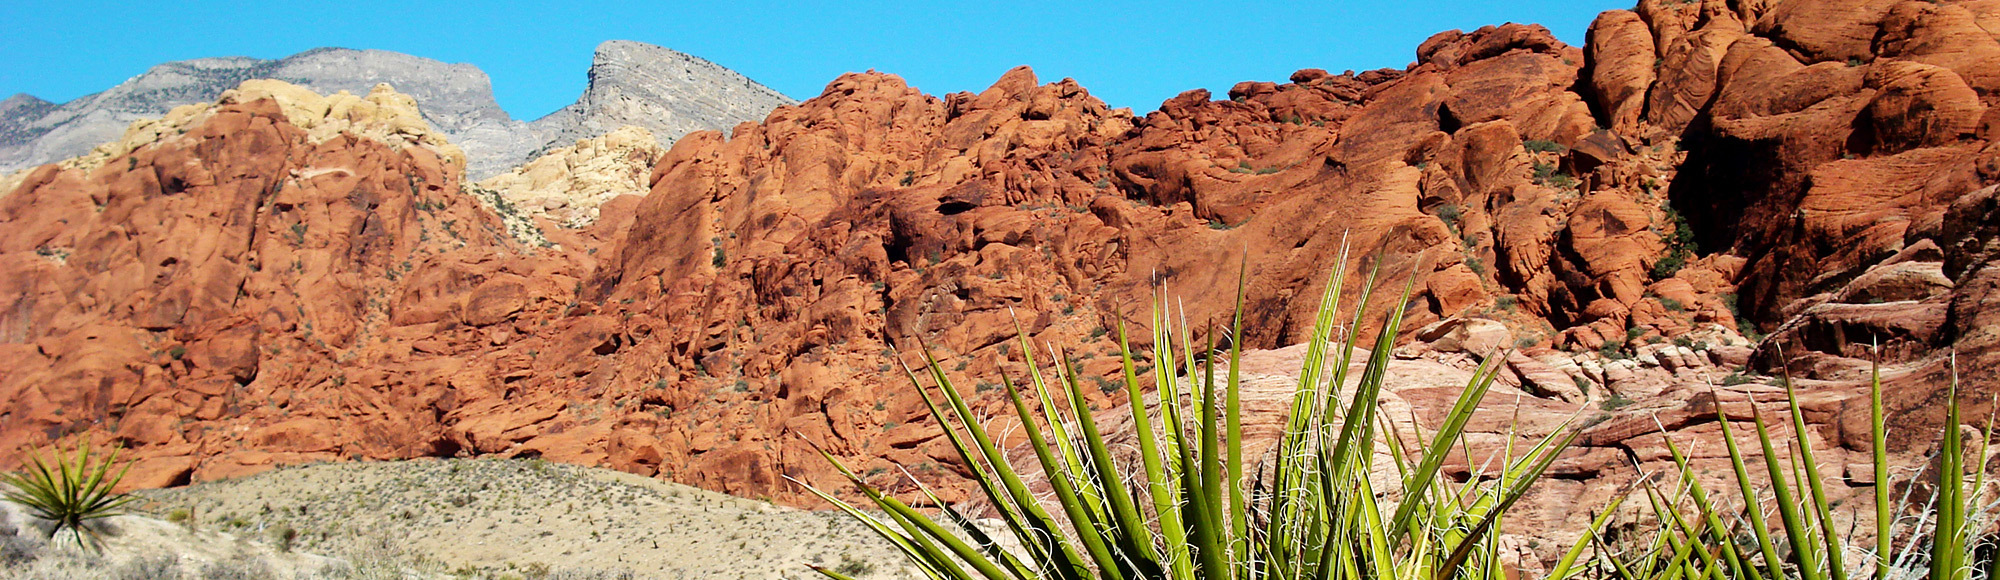 Red Rock Canyon Tour tour